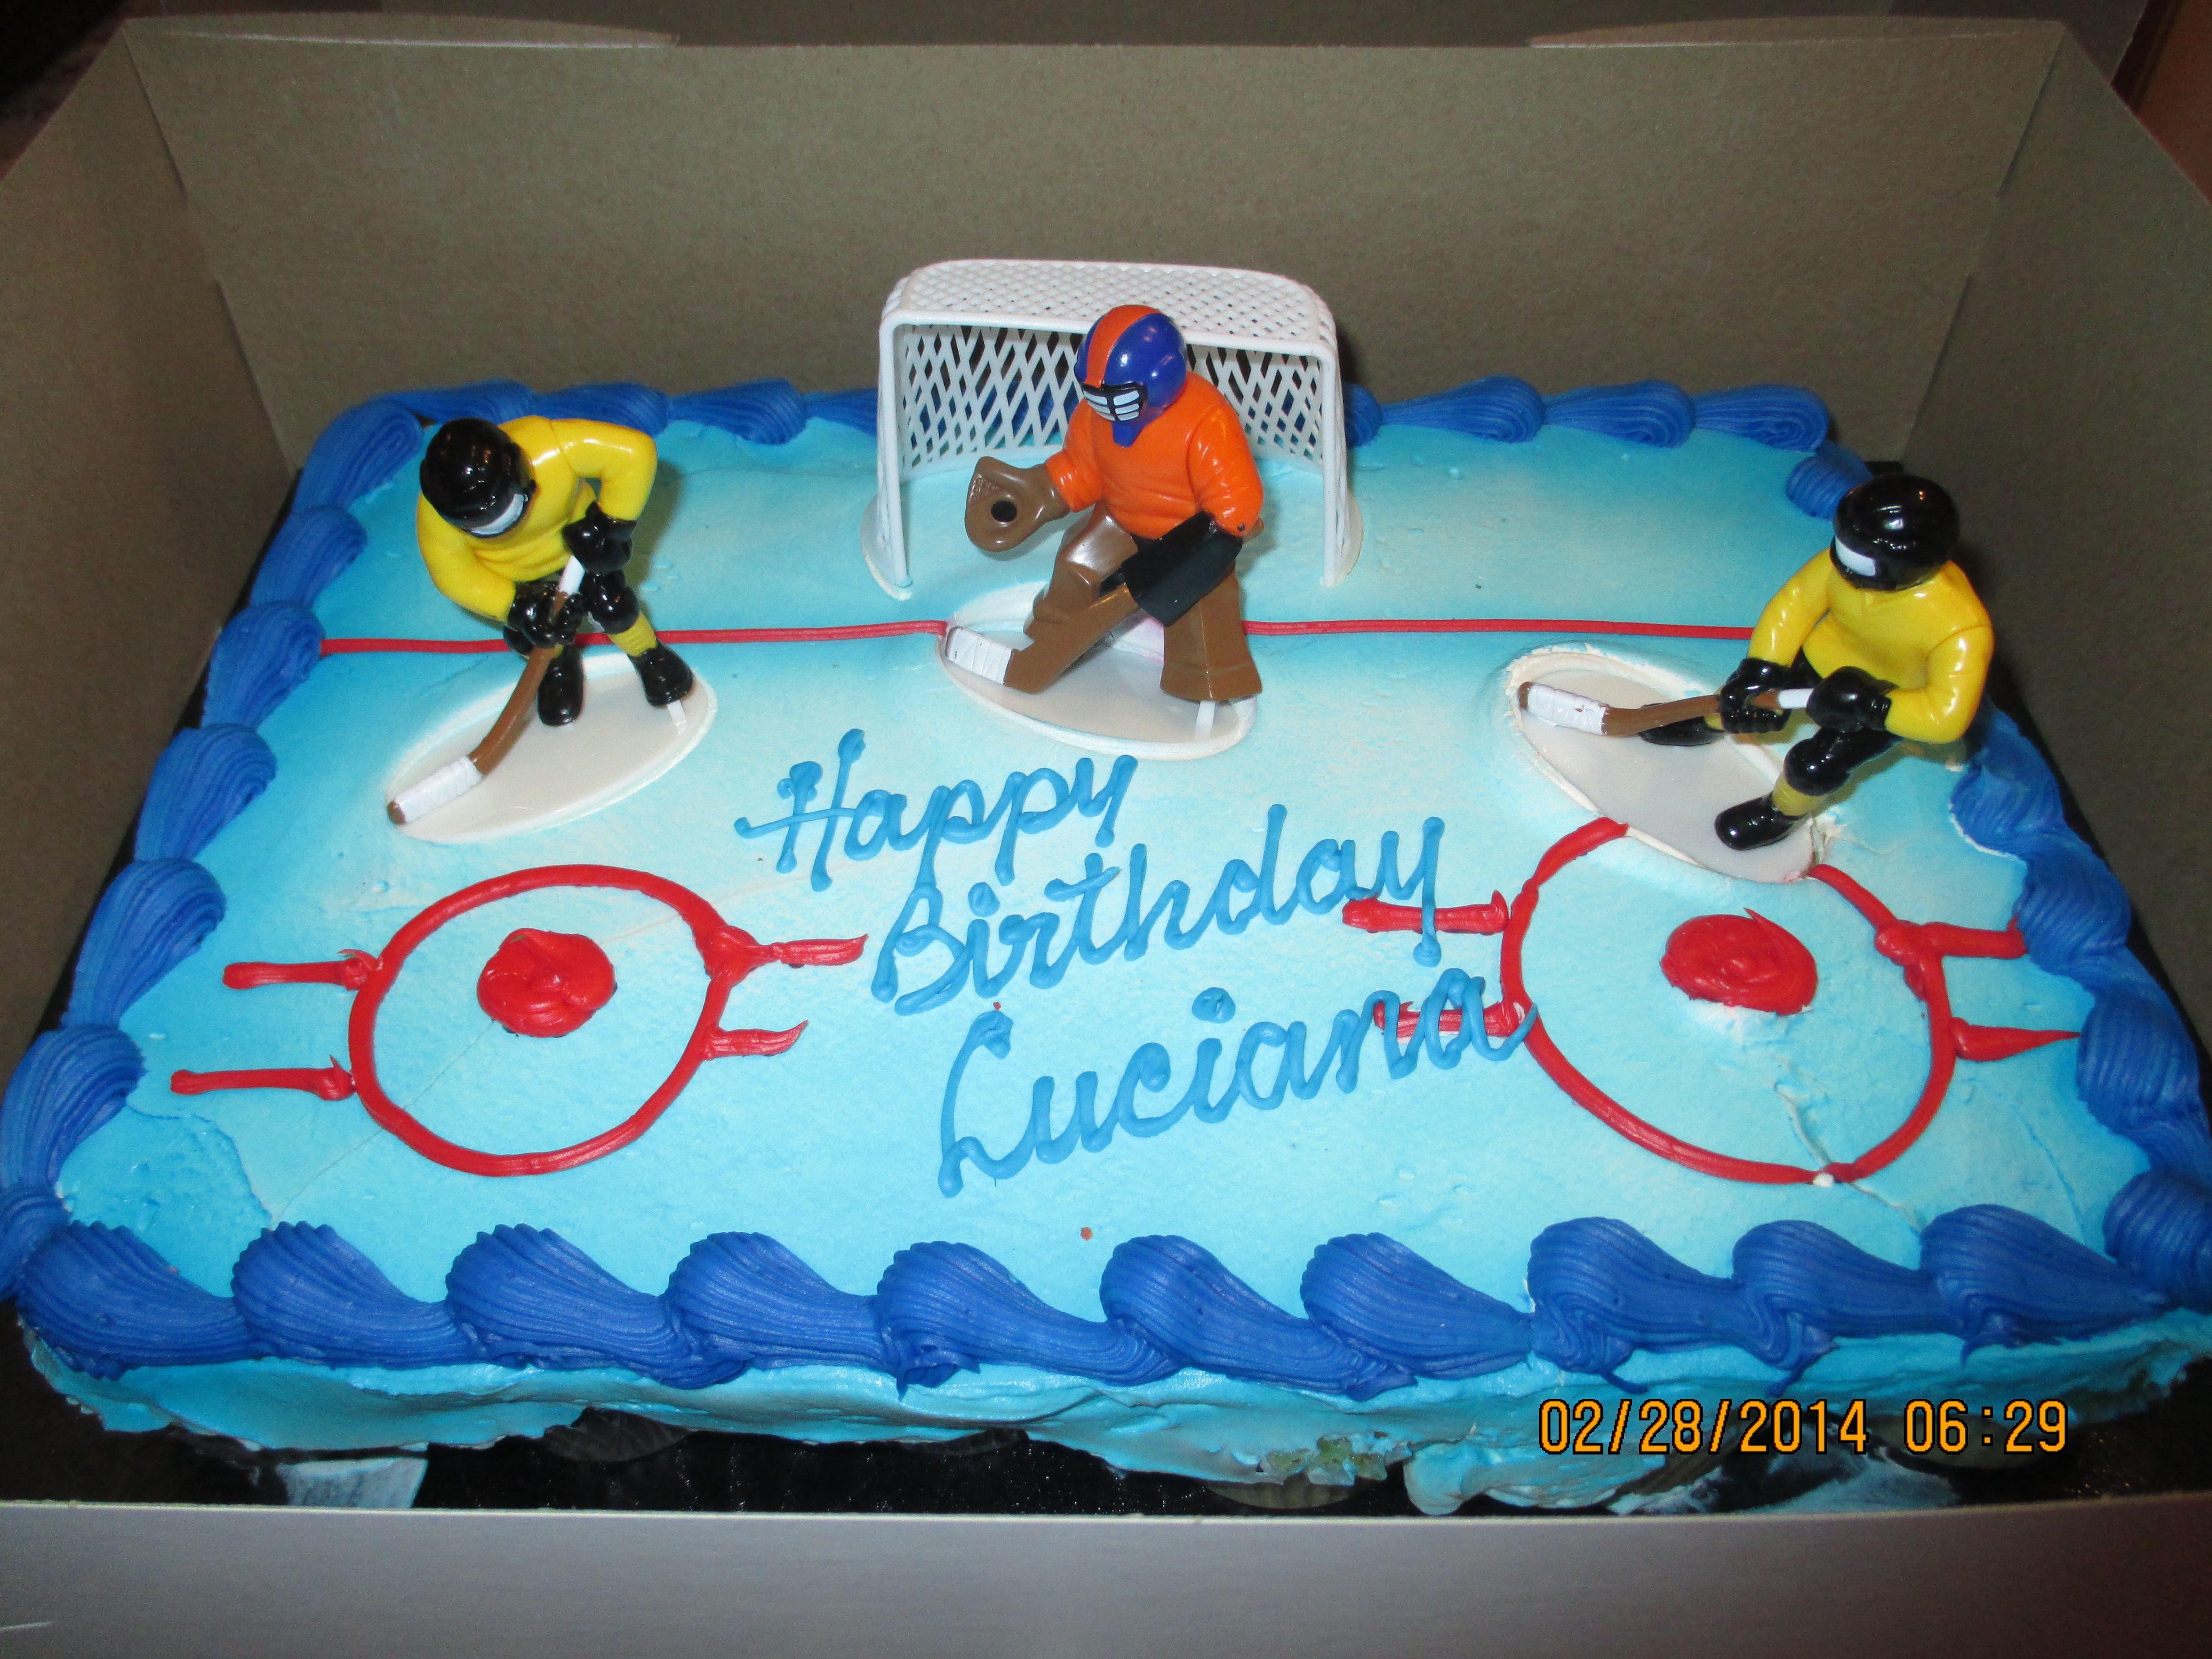 Food: Hockey cup cake birthday cake from loblaws. | Girl\'s Hockey ...